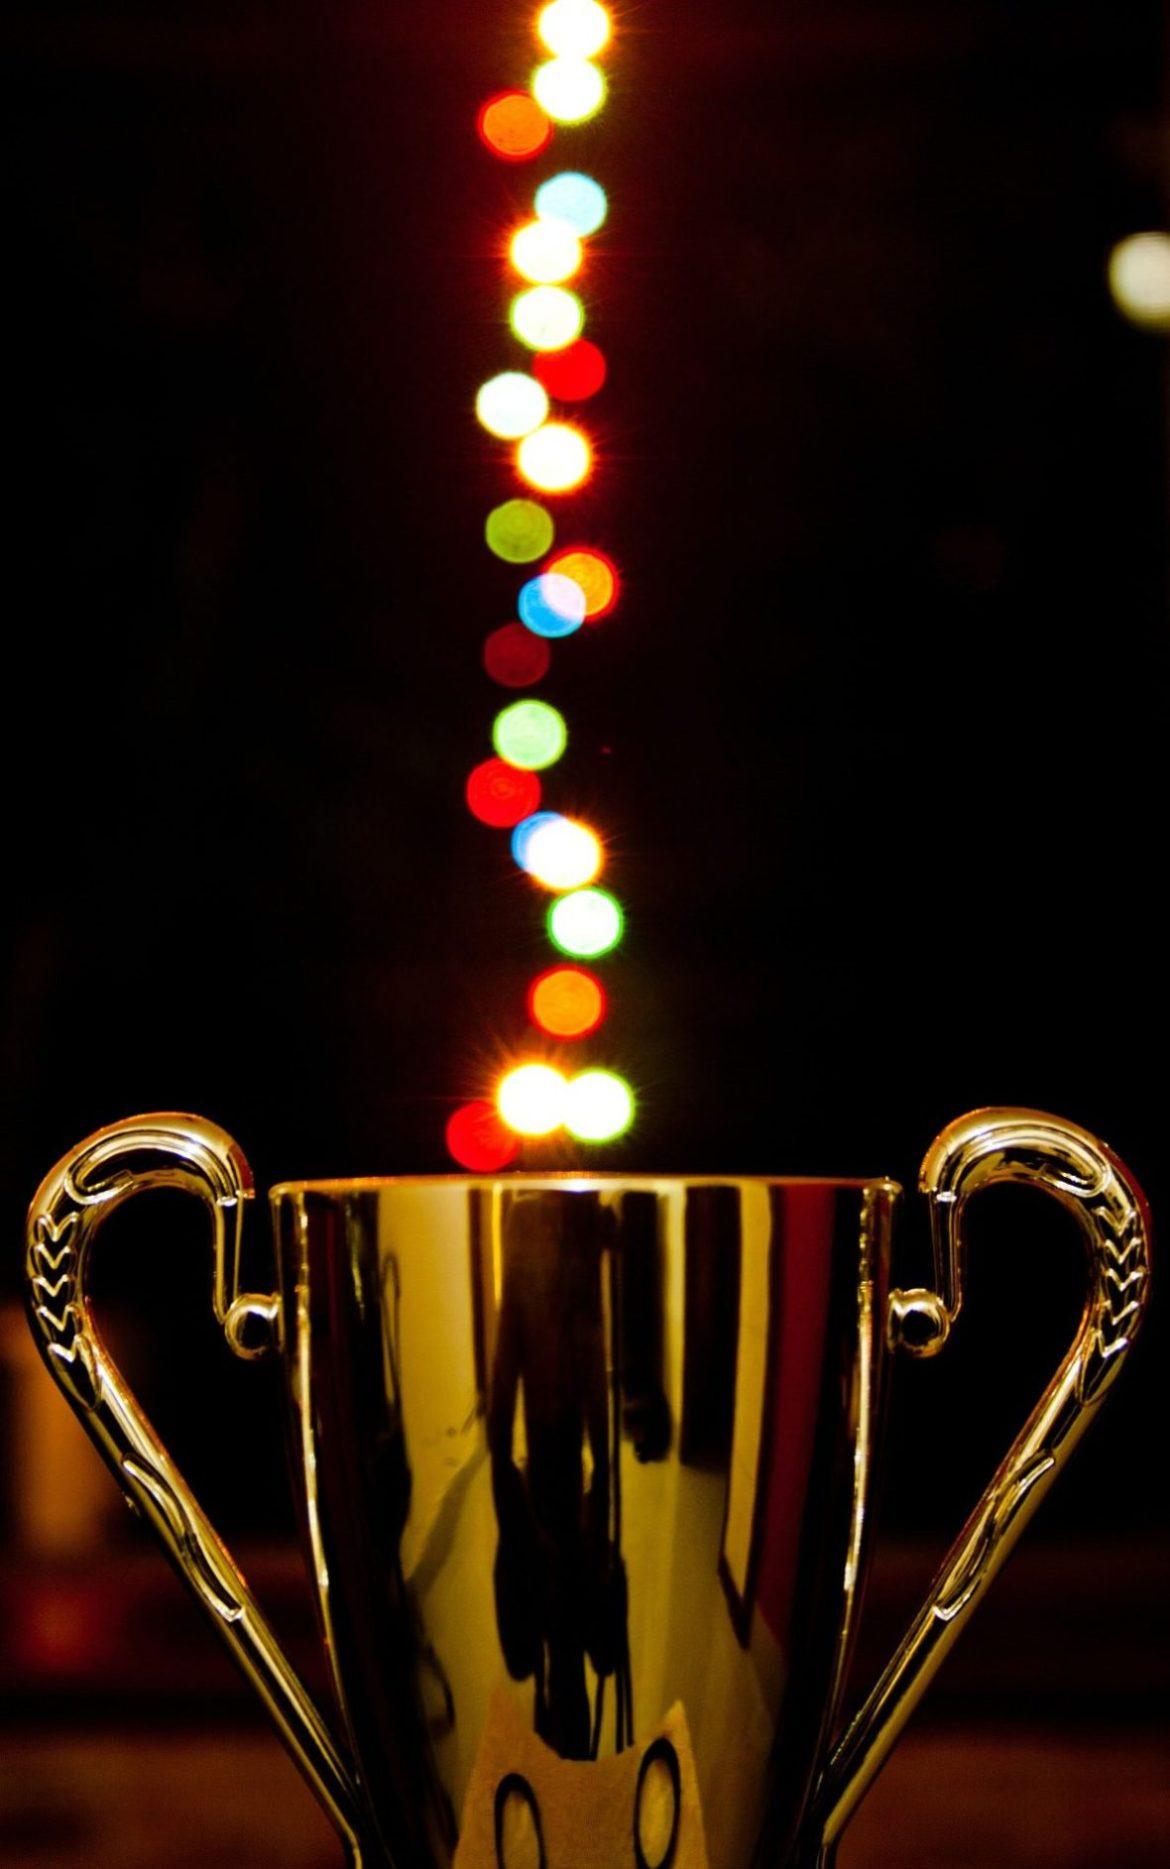 Altaworx Among 2017 AT&T Partner Exchange Summit Award Winners